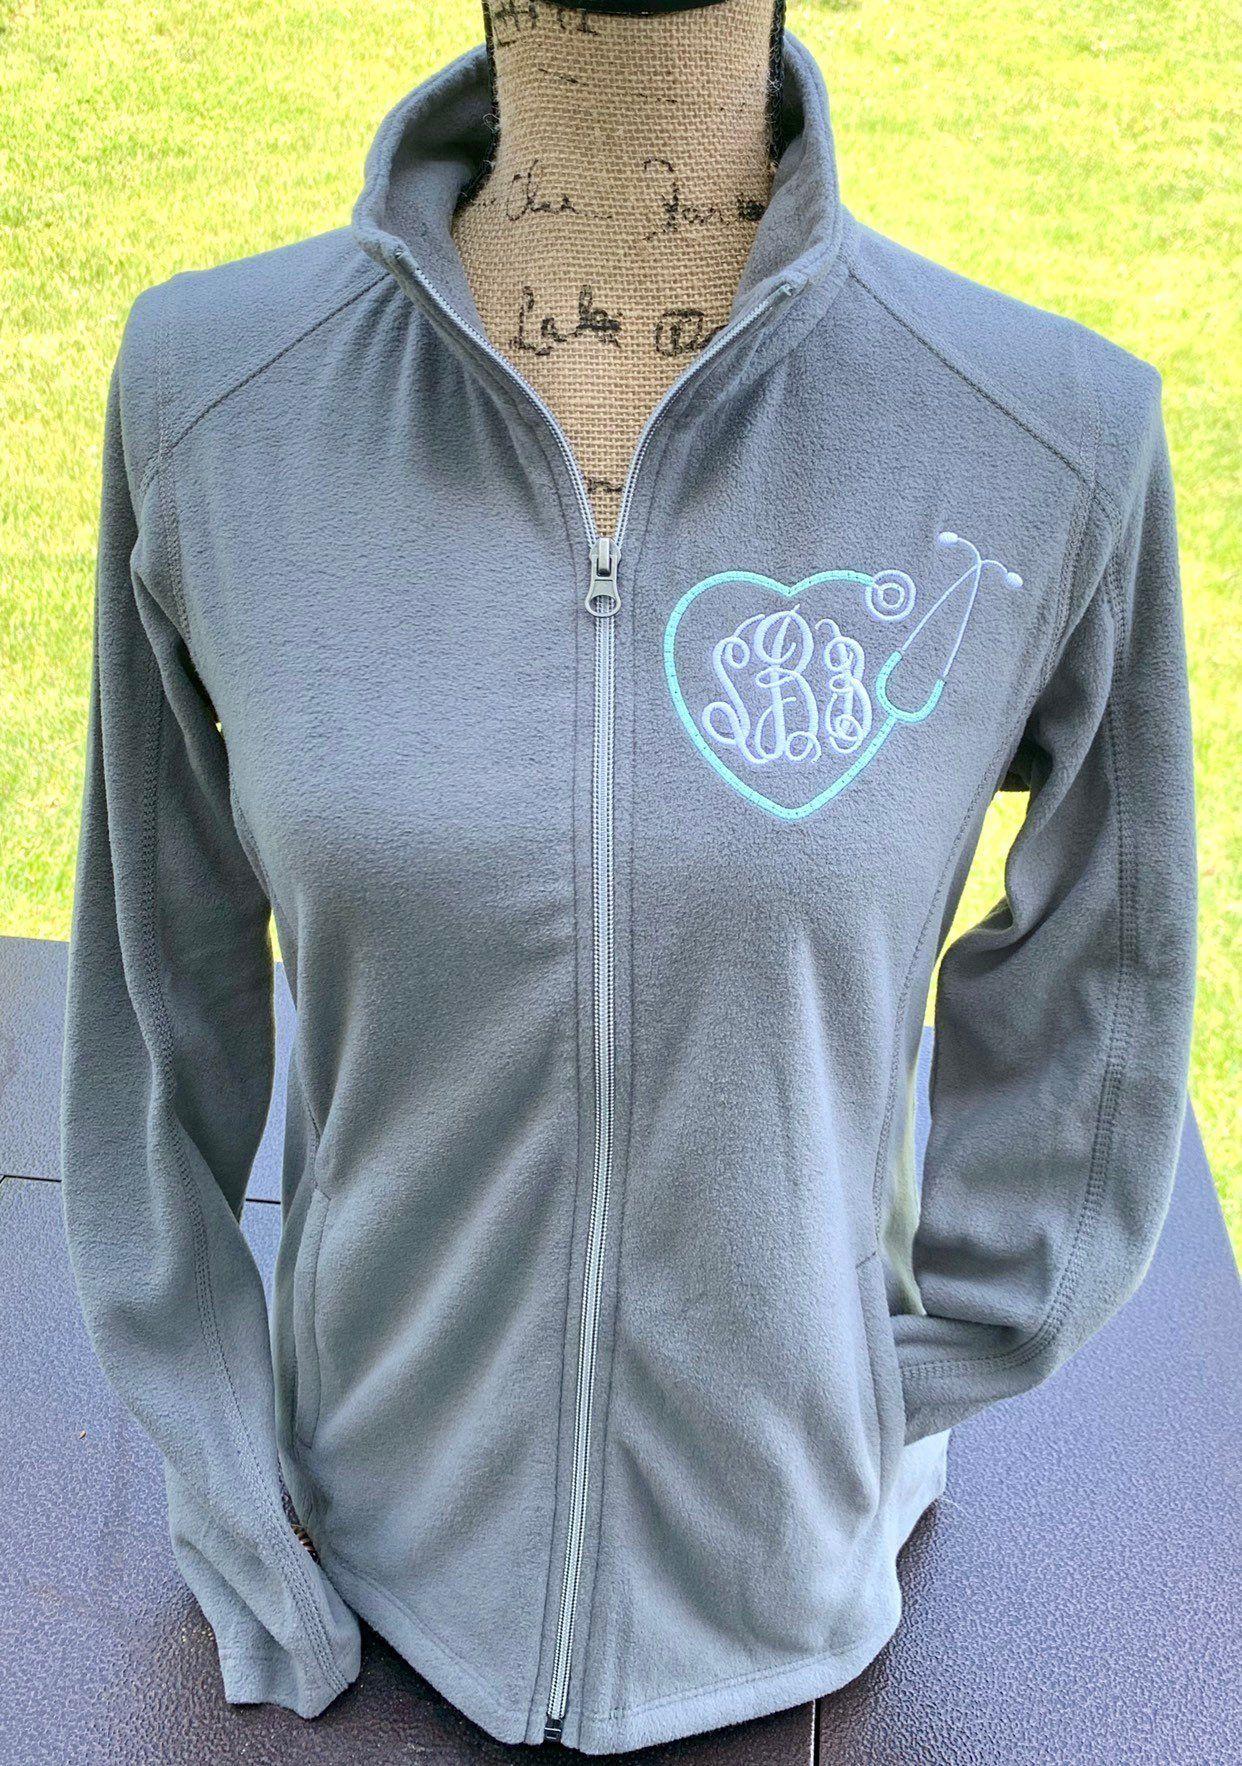 516f7569 Nurse jacket, nurse graduation gift, fleece full zip, gift for nurse,  monogrammed